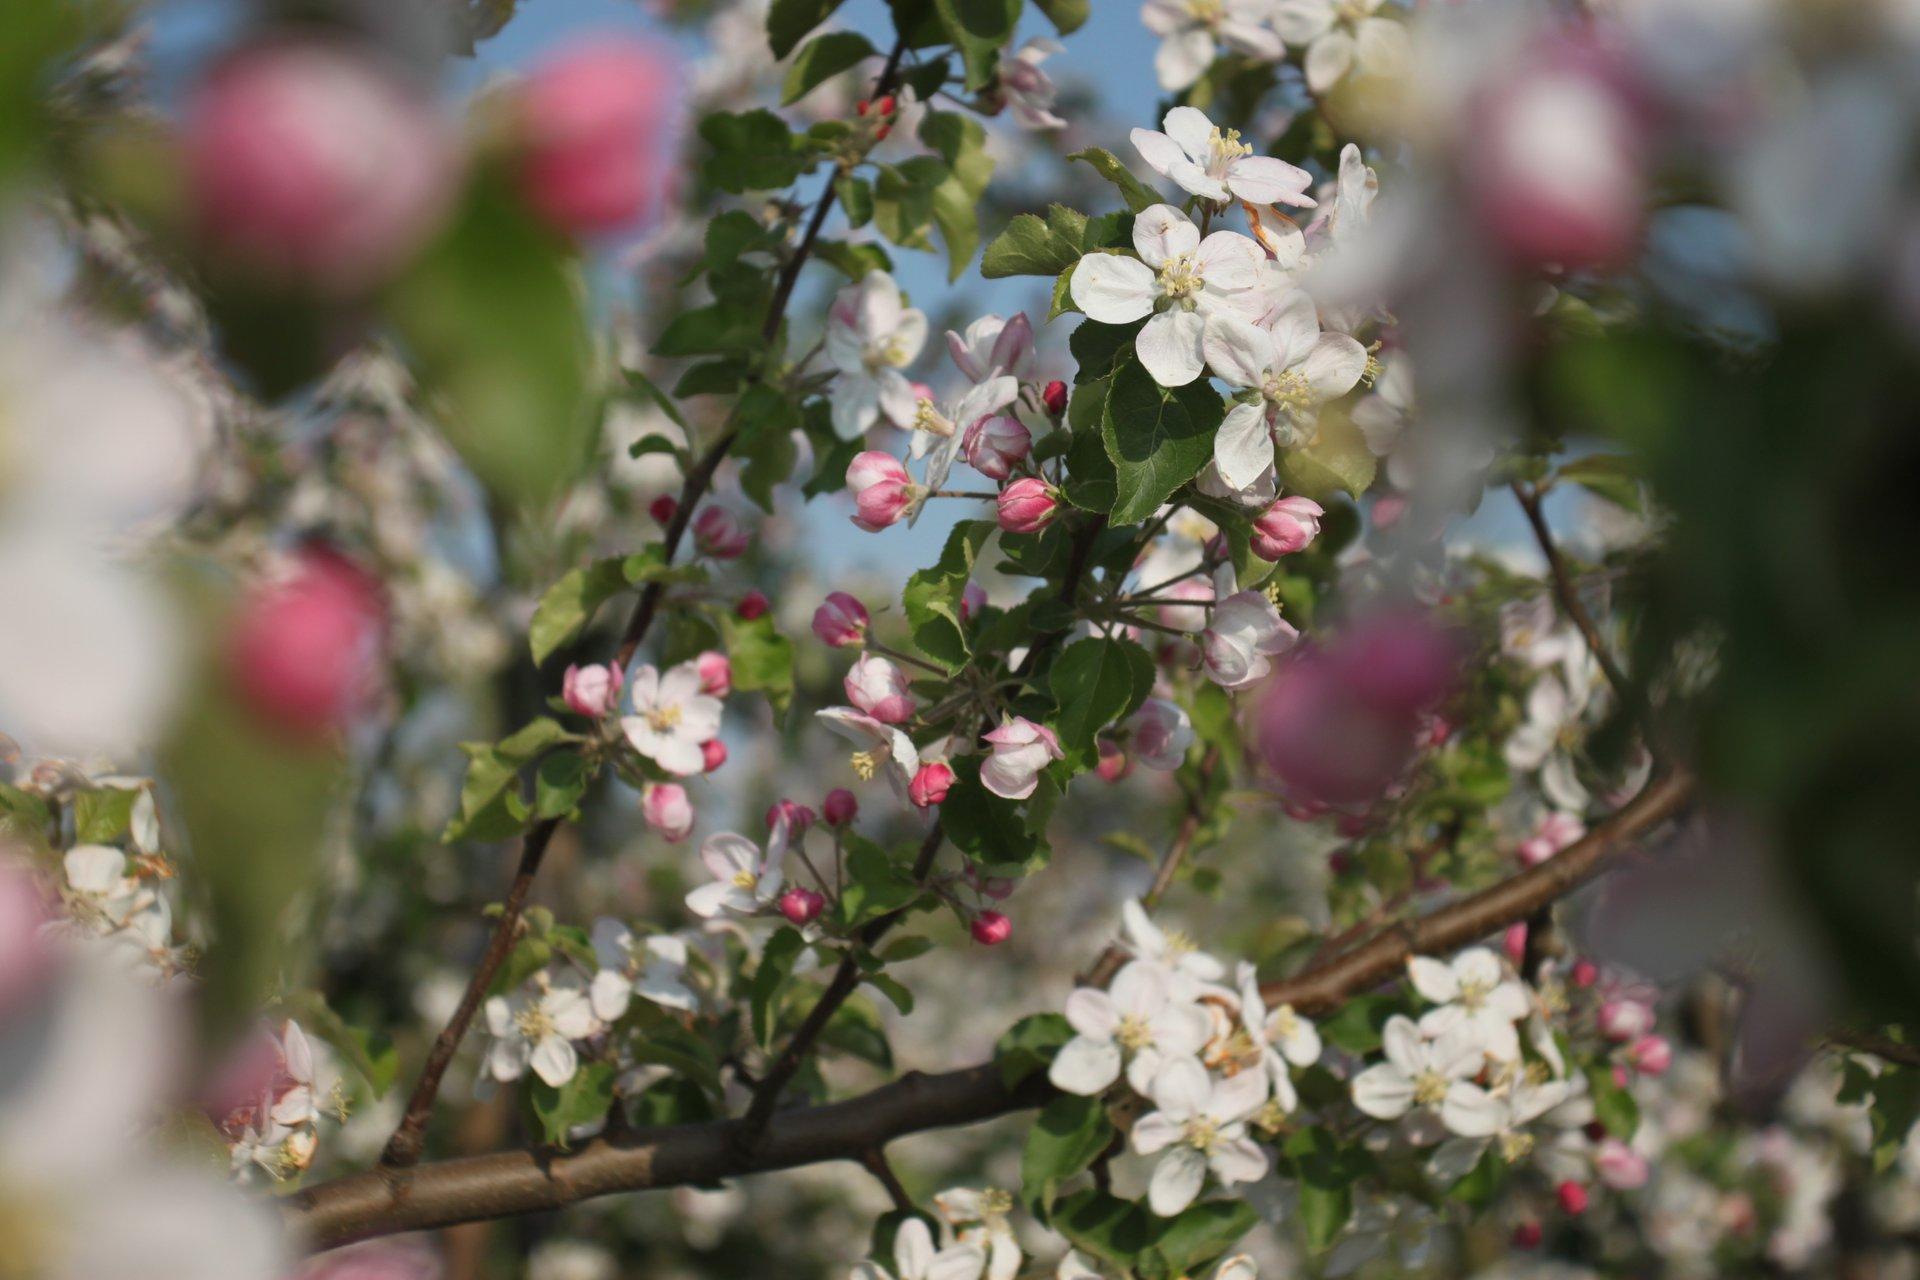 Blossom Season in Haspengouw in Belgium 2020 - Best Time